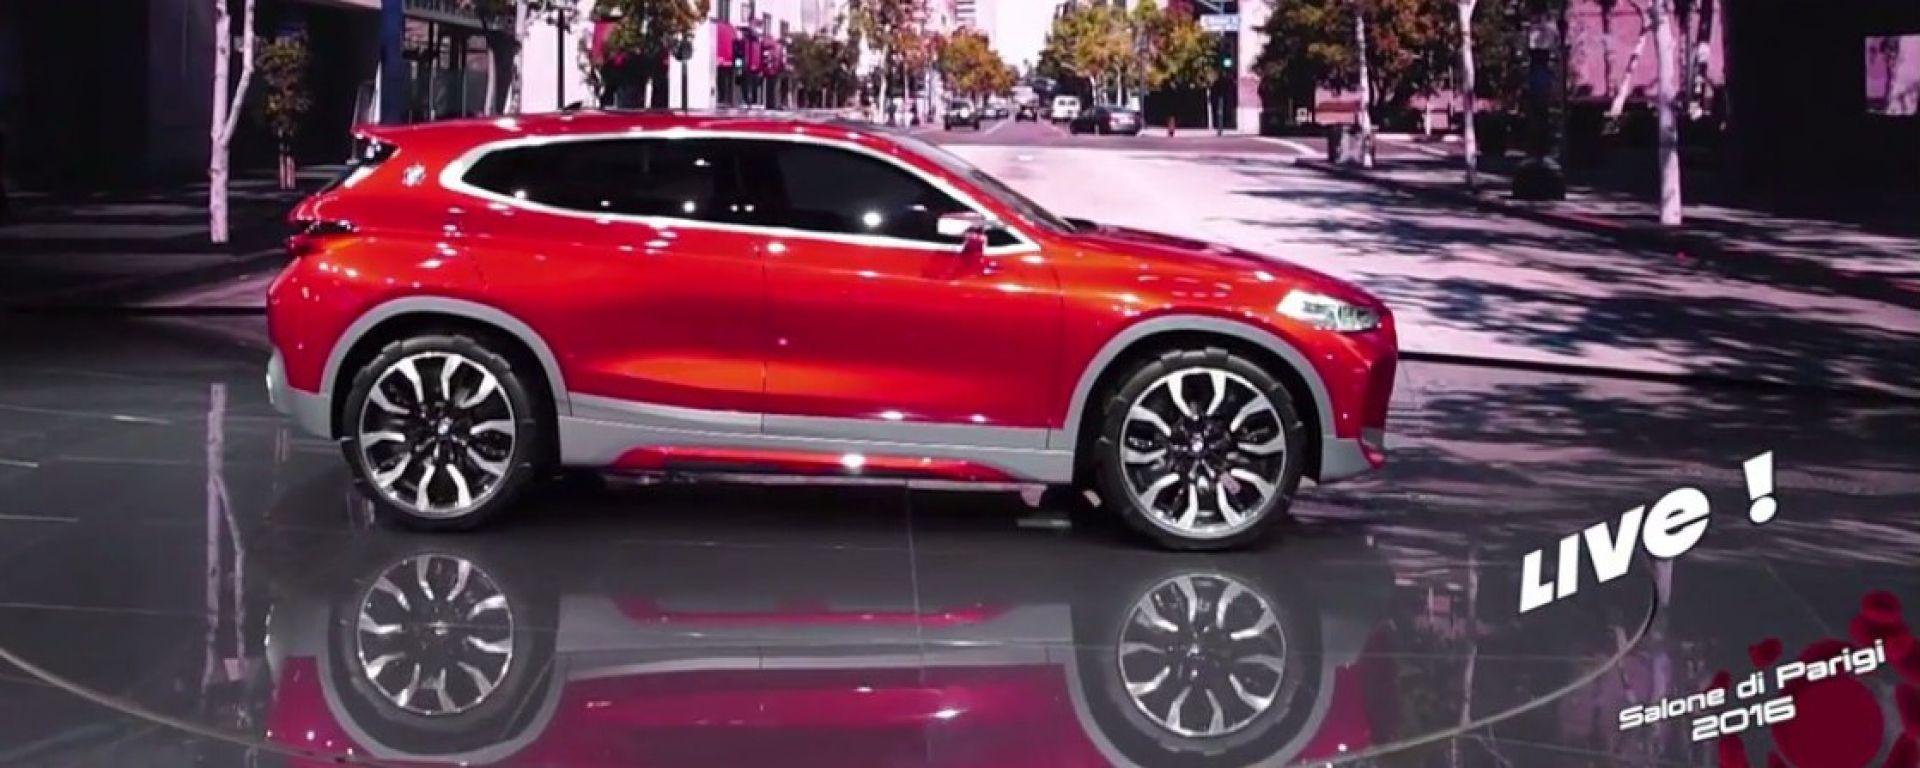 Live Parigi 2016: BMW Concept X2 in video